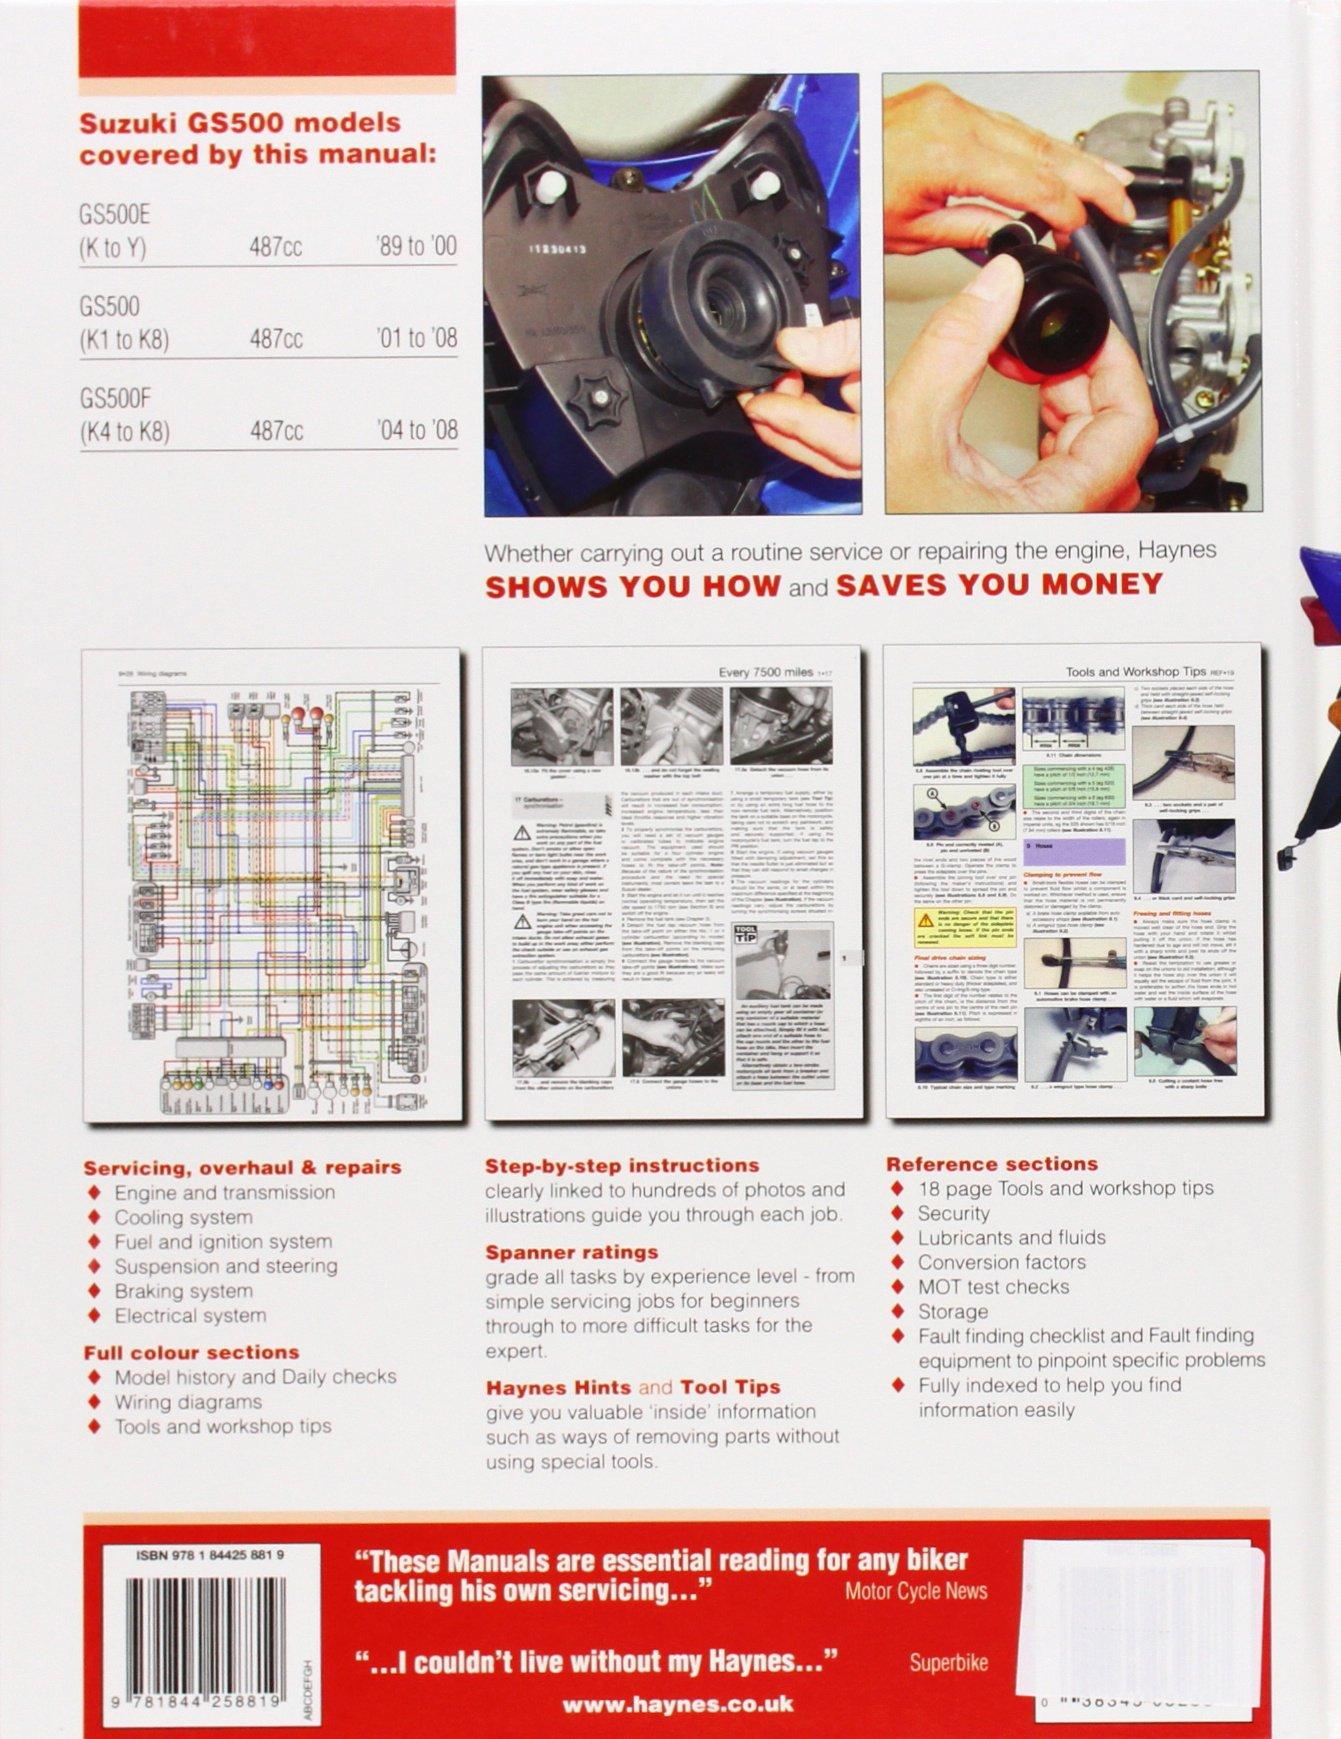 Suzuki GS500 Twin 1989-2008 (Haynes Service & Repair Manual): John Haynes:  9781844258819: Amazon.com: Books